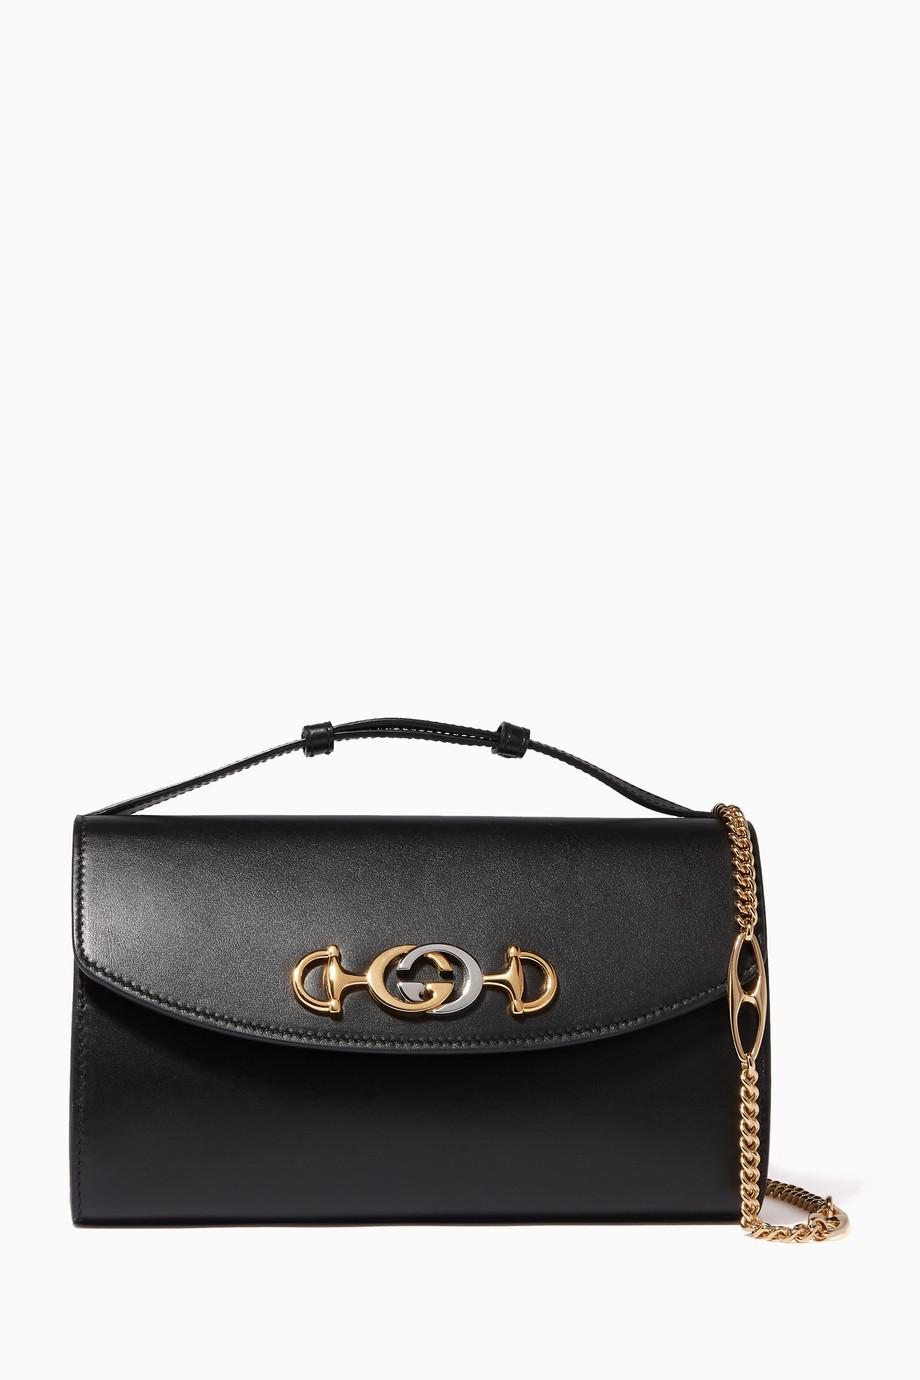 3beb8d4c6 Shop Gucci Black Zumi Small Shoulder Bag for Women   Ounass UAE